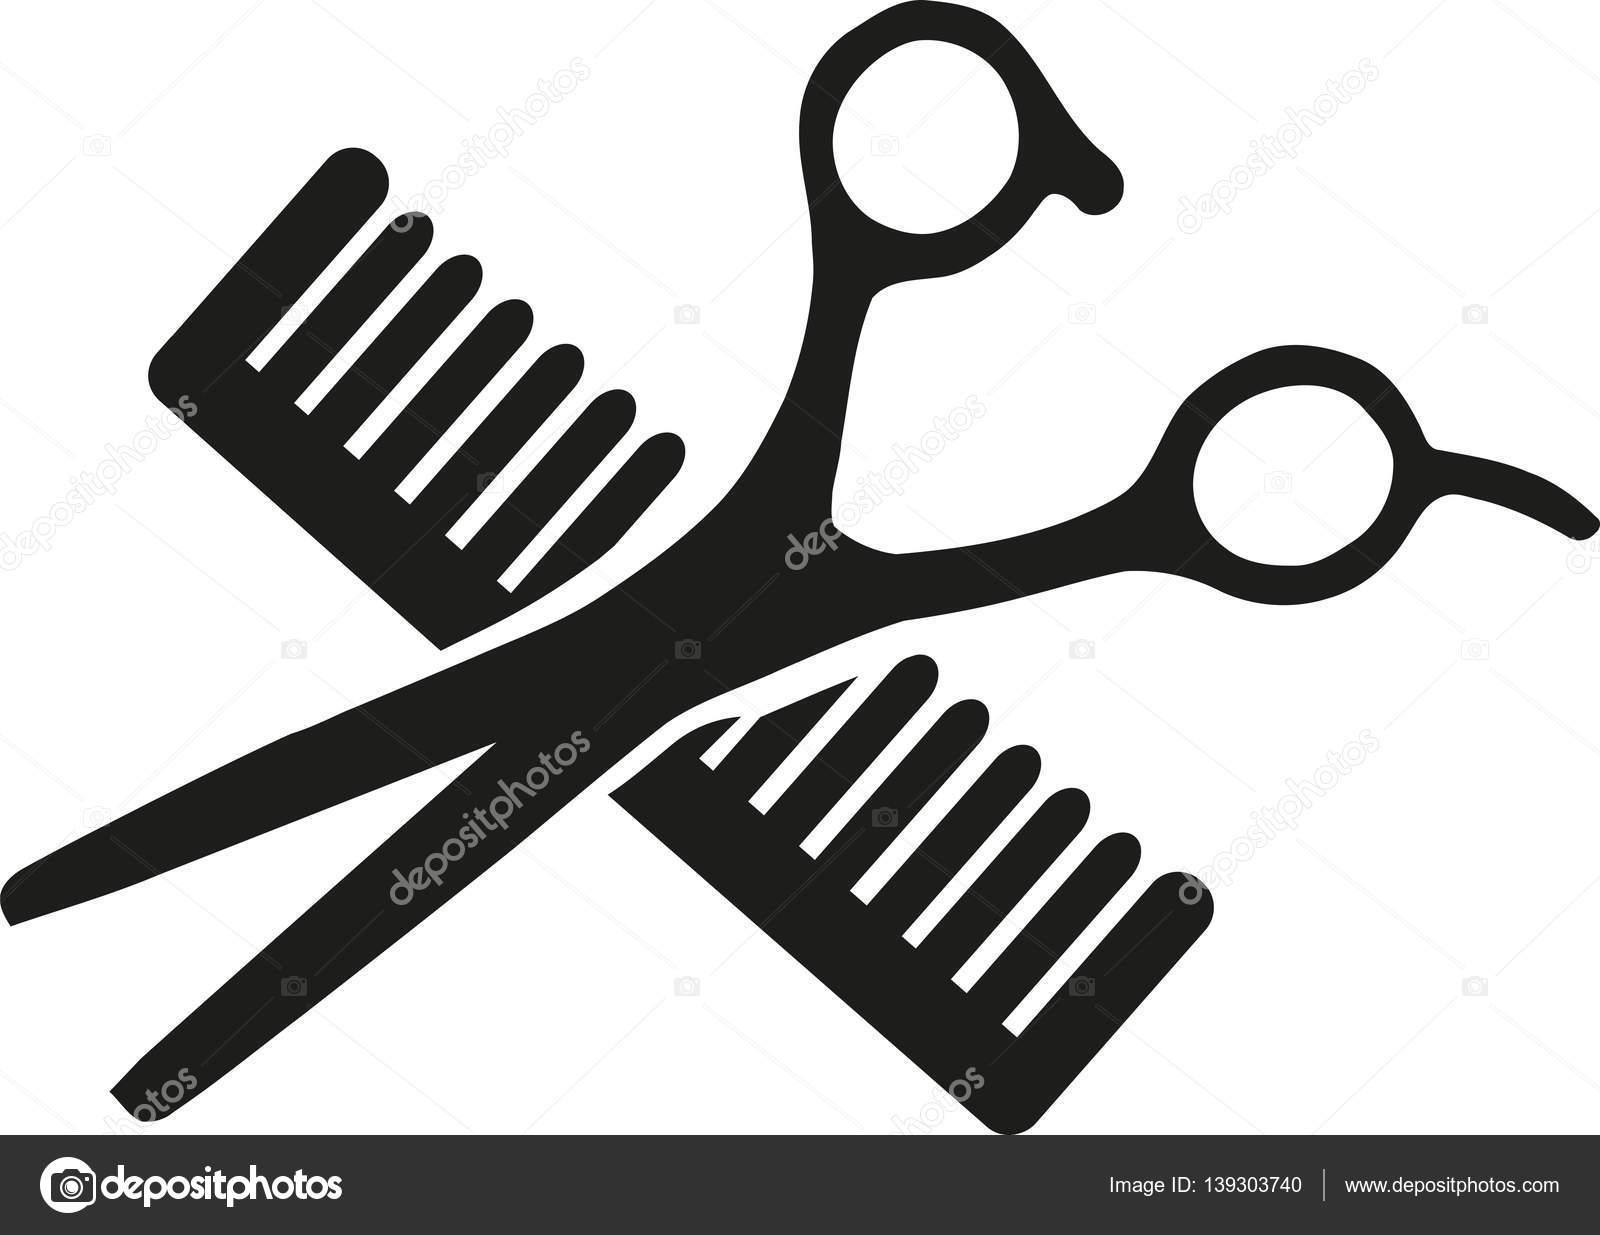 scissor and comb crossed stock vector miceking 139303740 rh depositphotos com Open Scissors Scissor Knife Crossed Logos